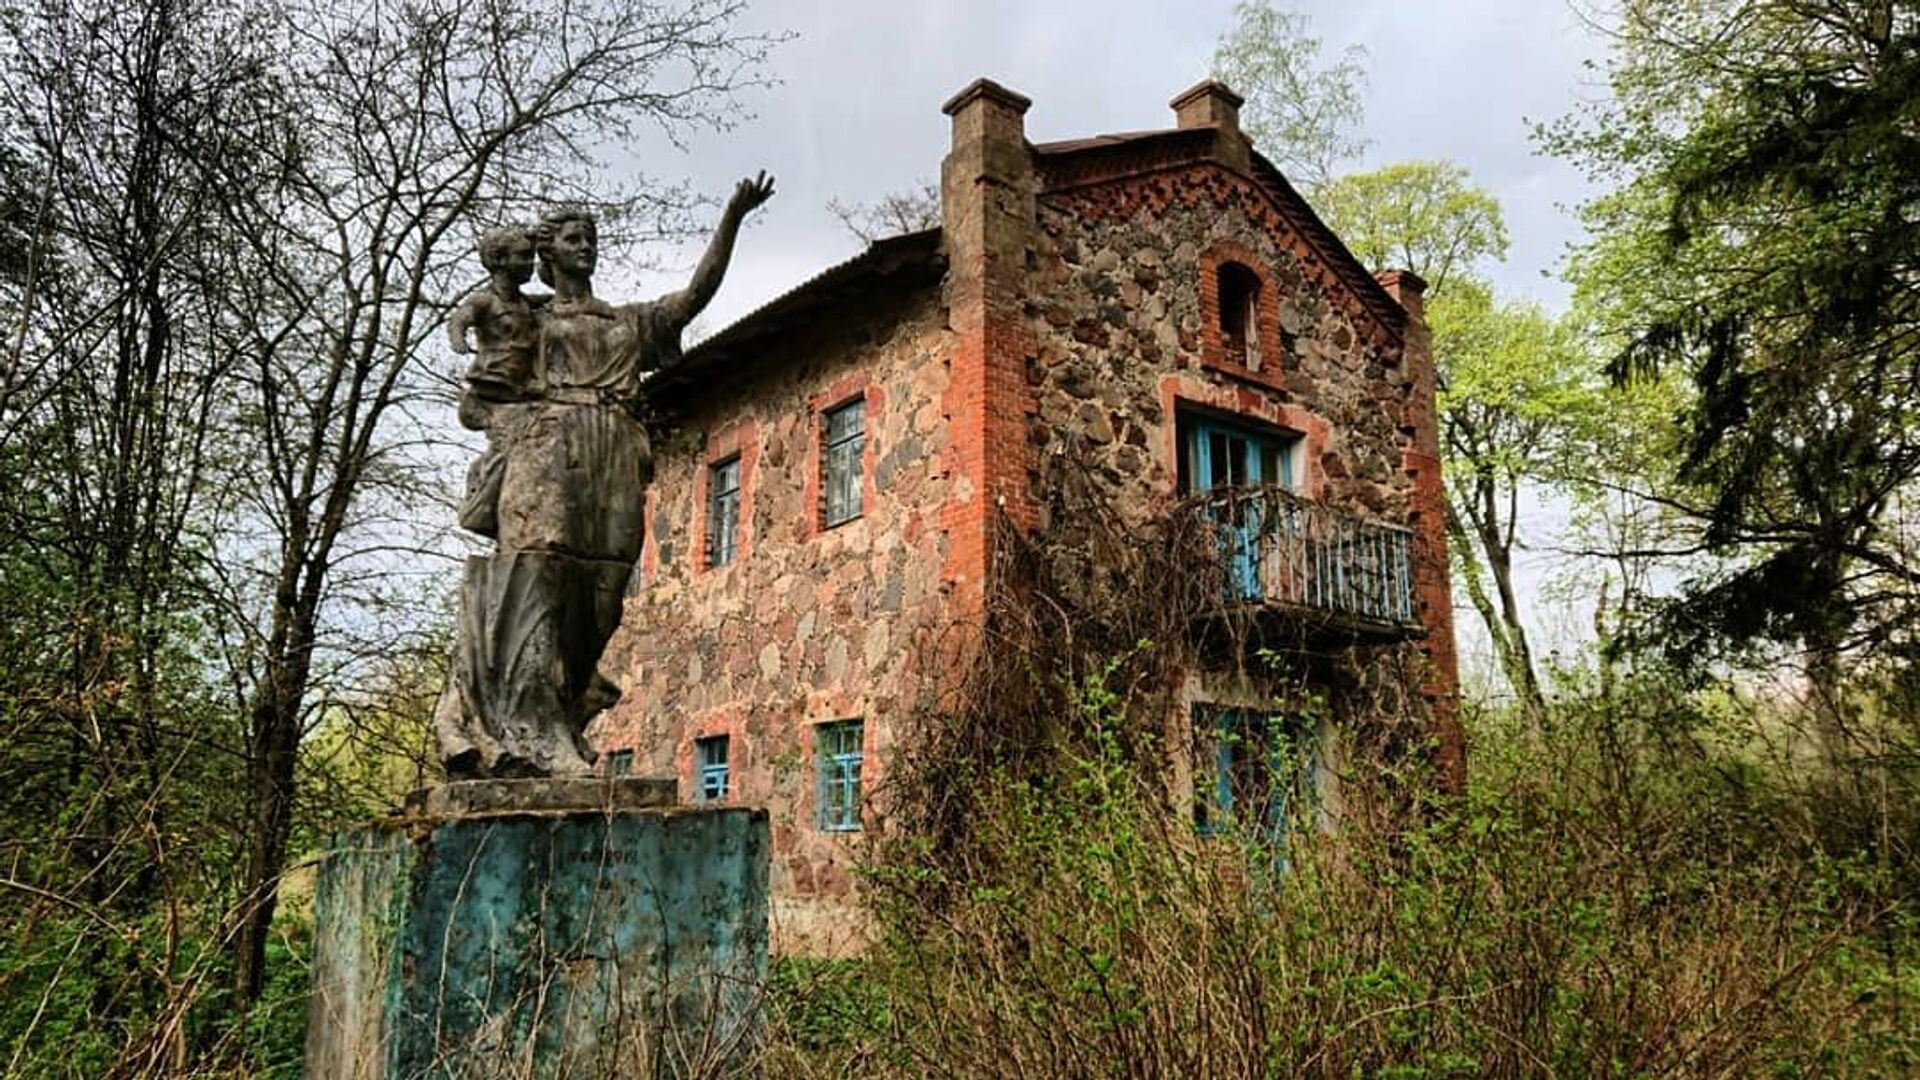 Усадьба Новицких в деревне Совейки  - Sputnik Беларусь, 1920, 29.06.2021